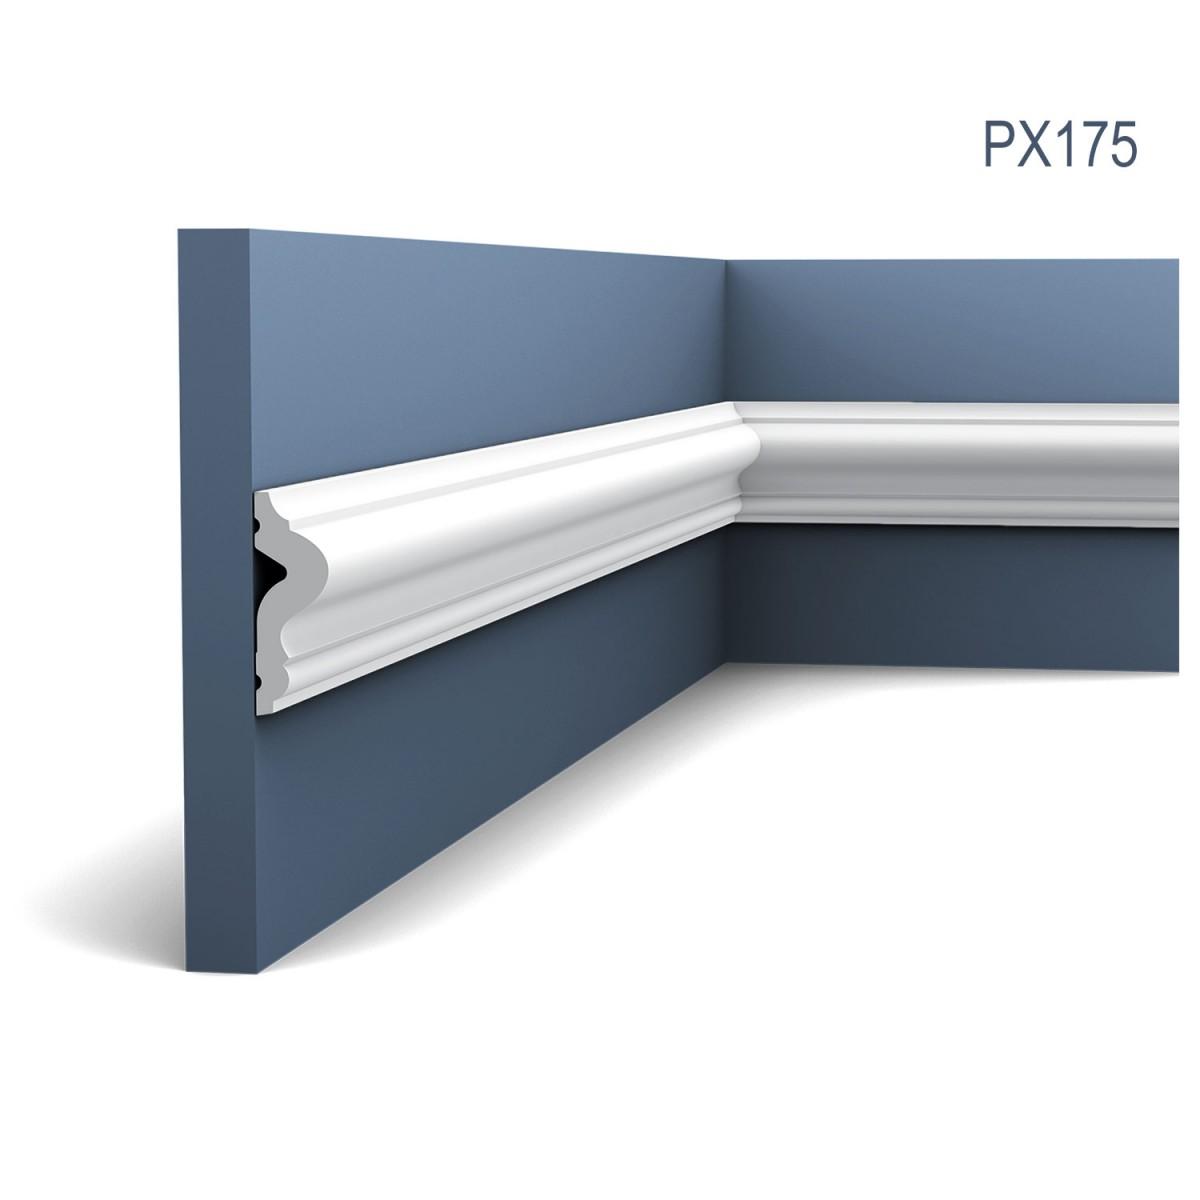 Brau Axxent PX175, Dimensiuni: 200 X 1.7 X 5 cm, Orac Decor